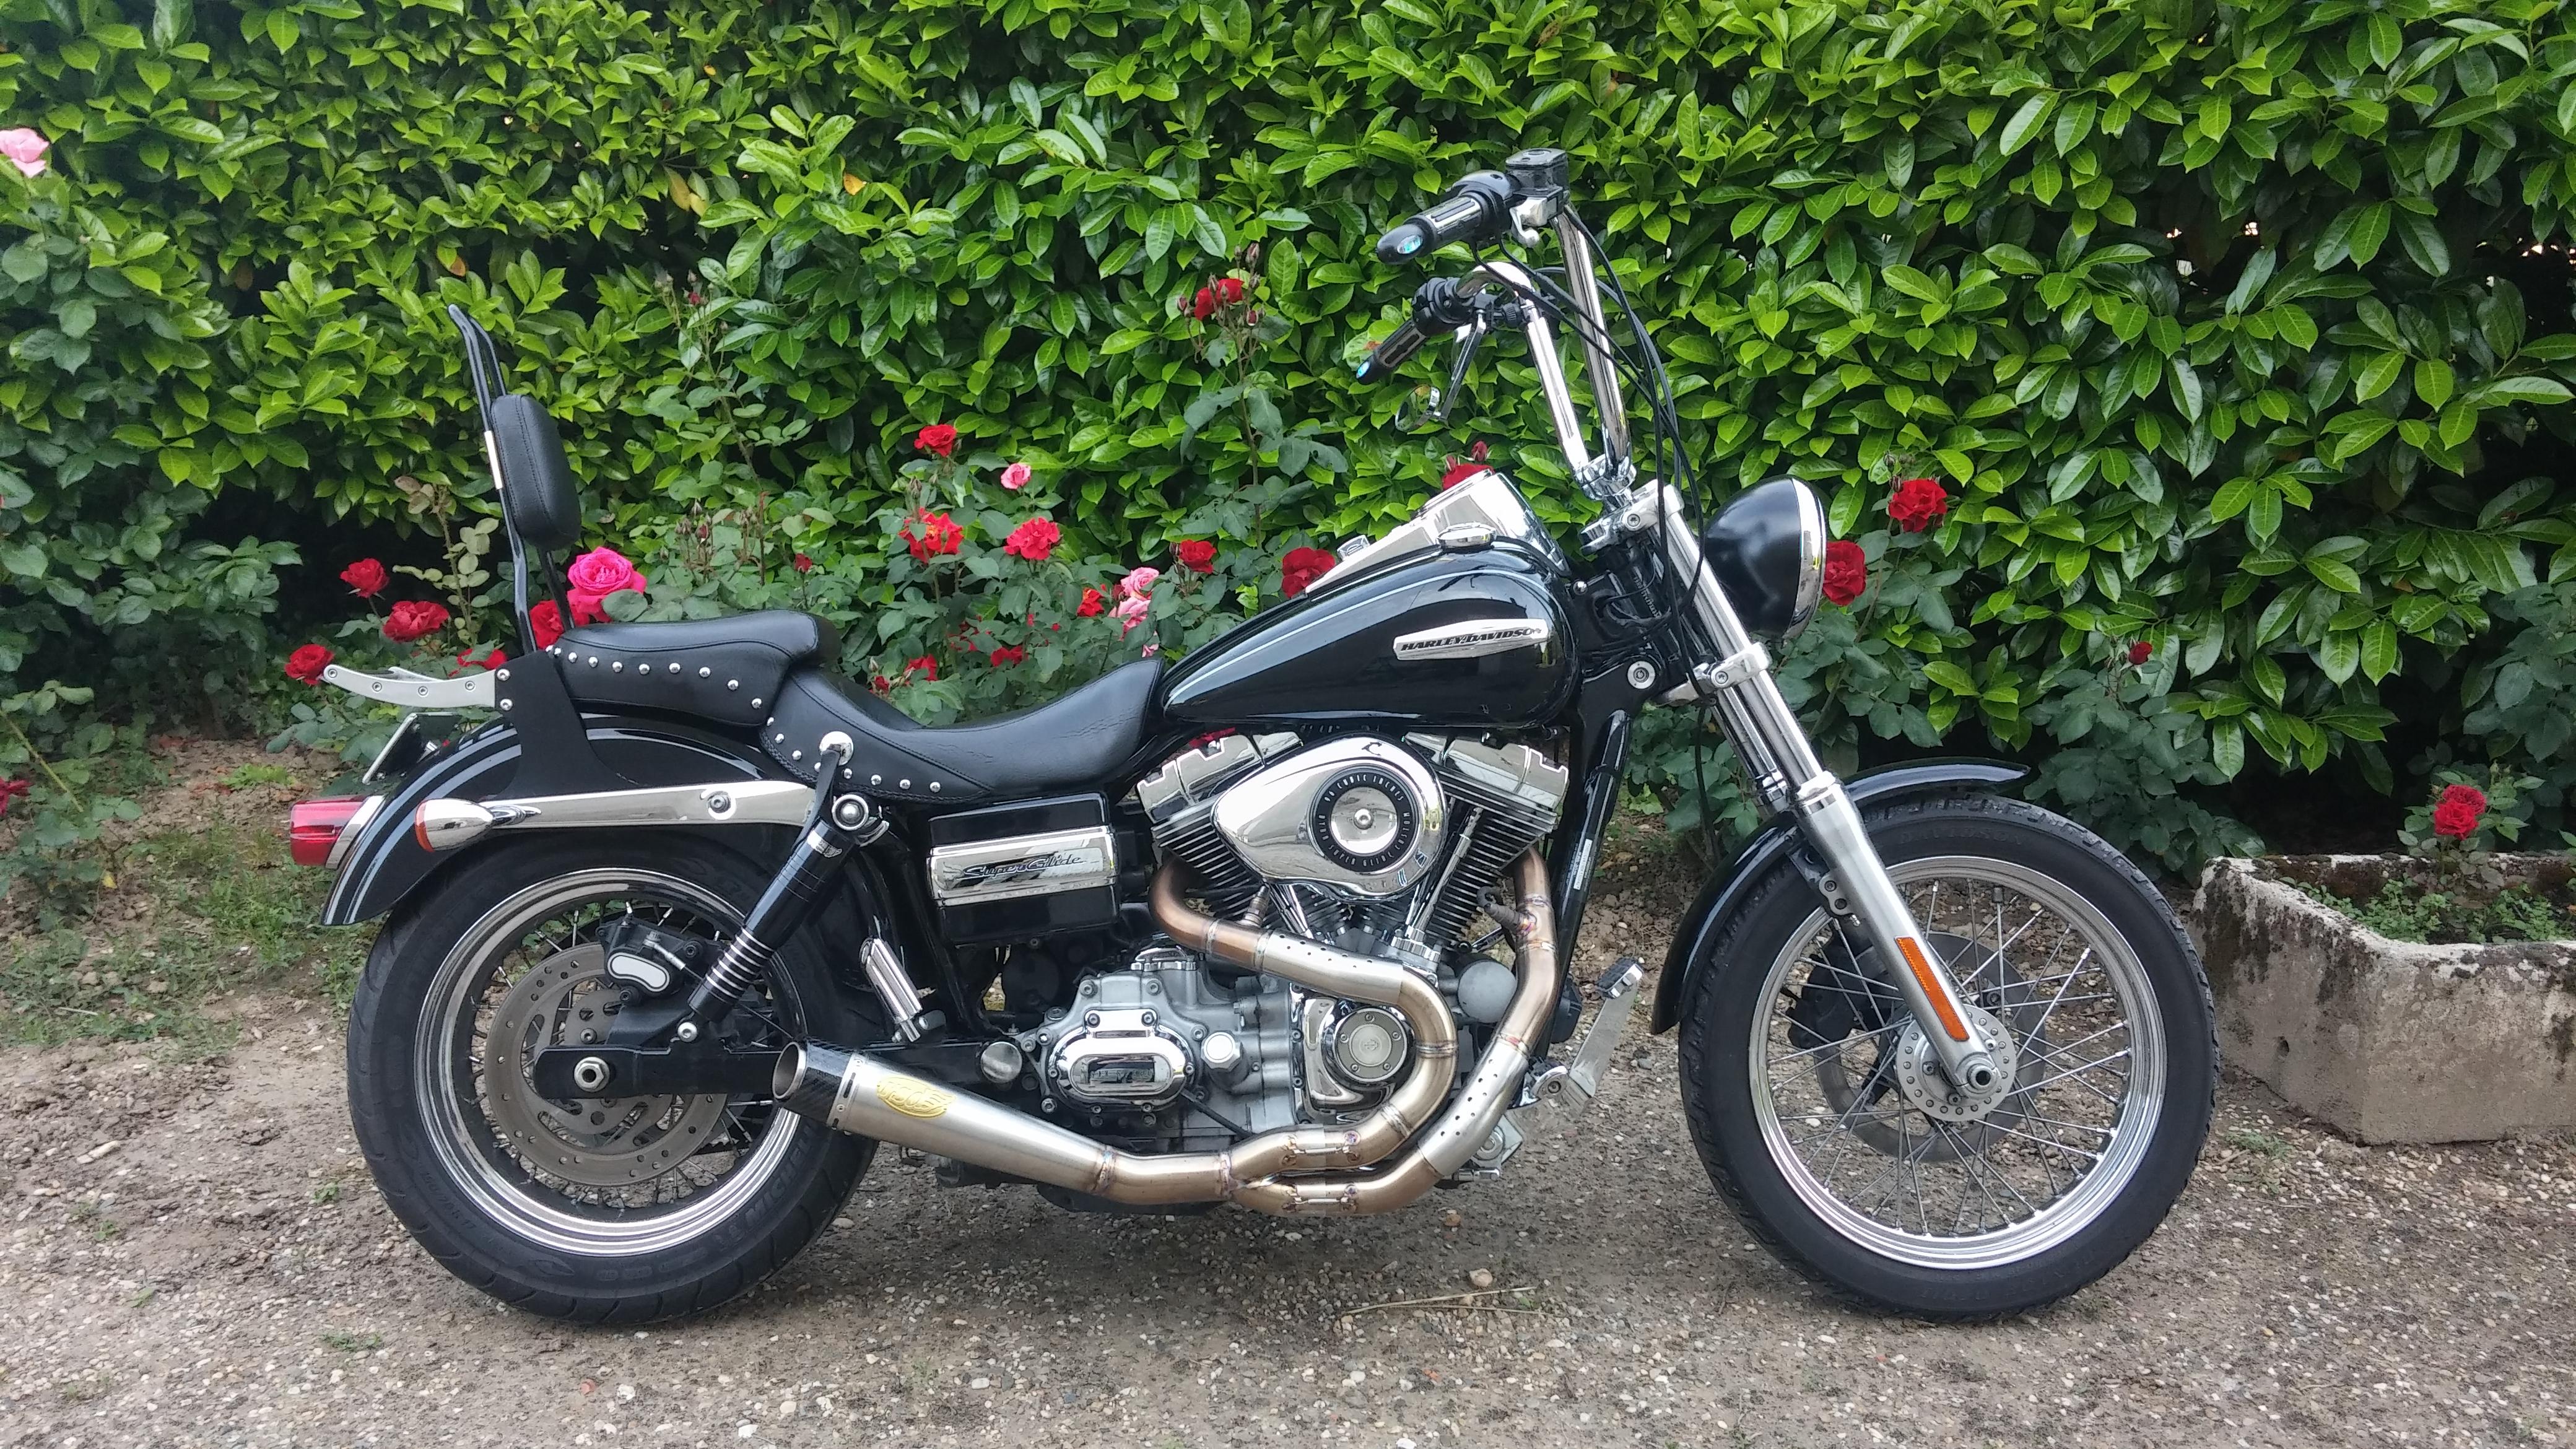 DYNA SUPER GLIDE  combien sommes nous sur Passion-Harley - Page 5 30432520160527185533